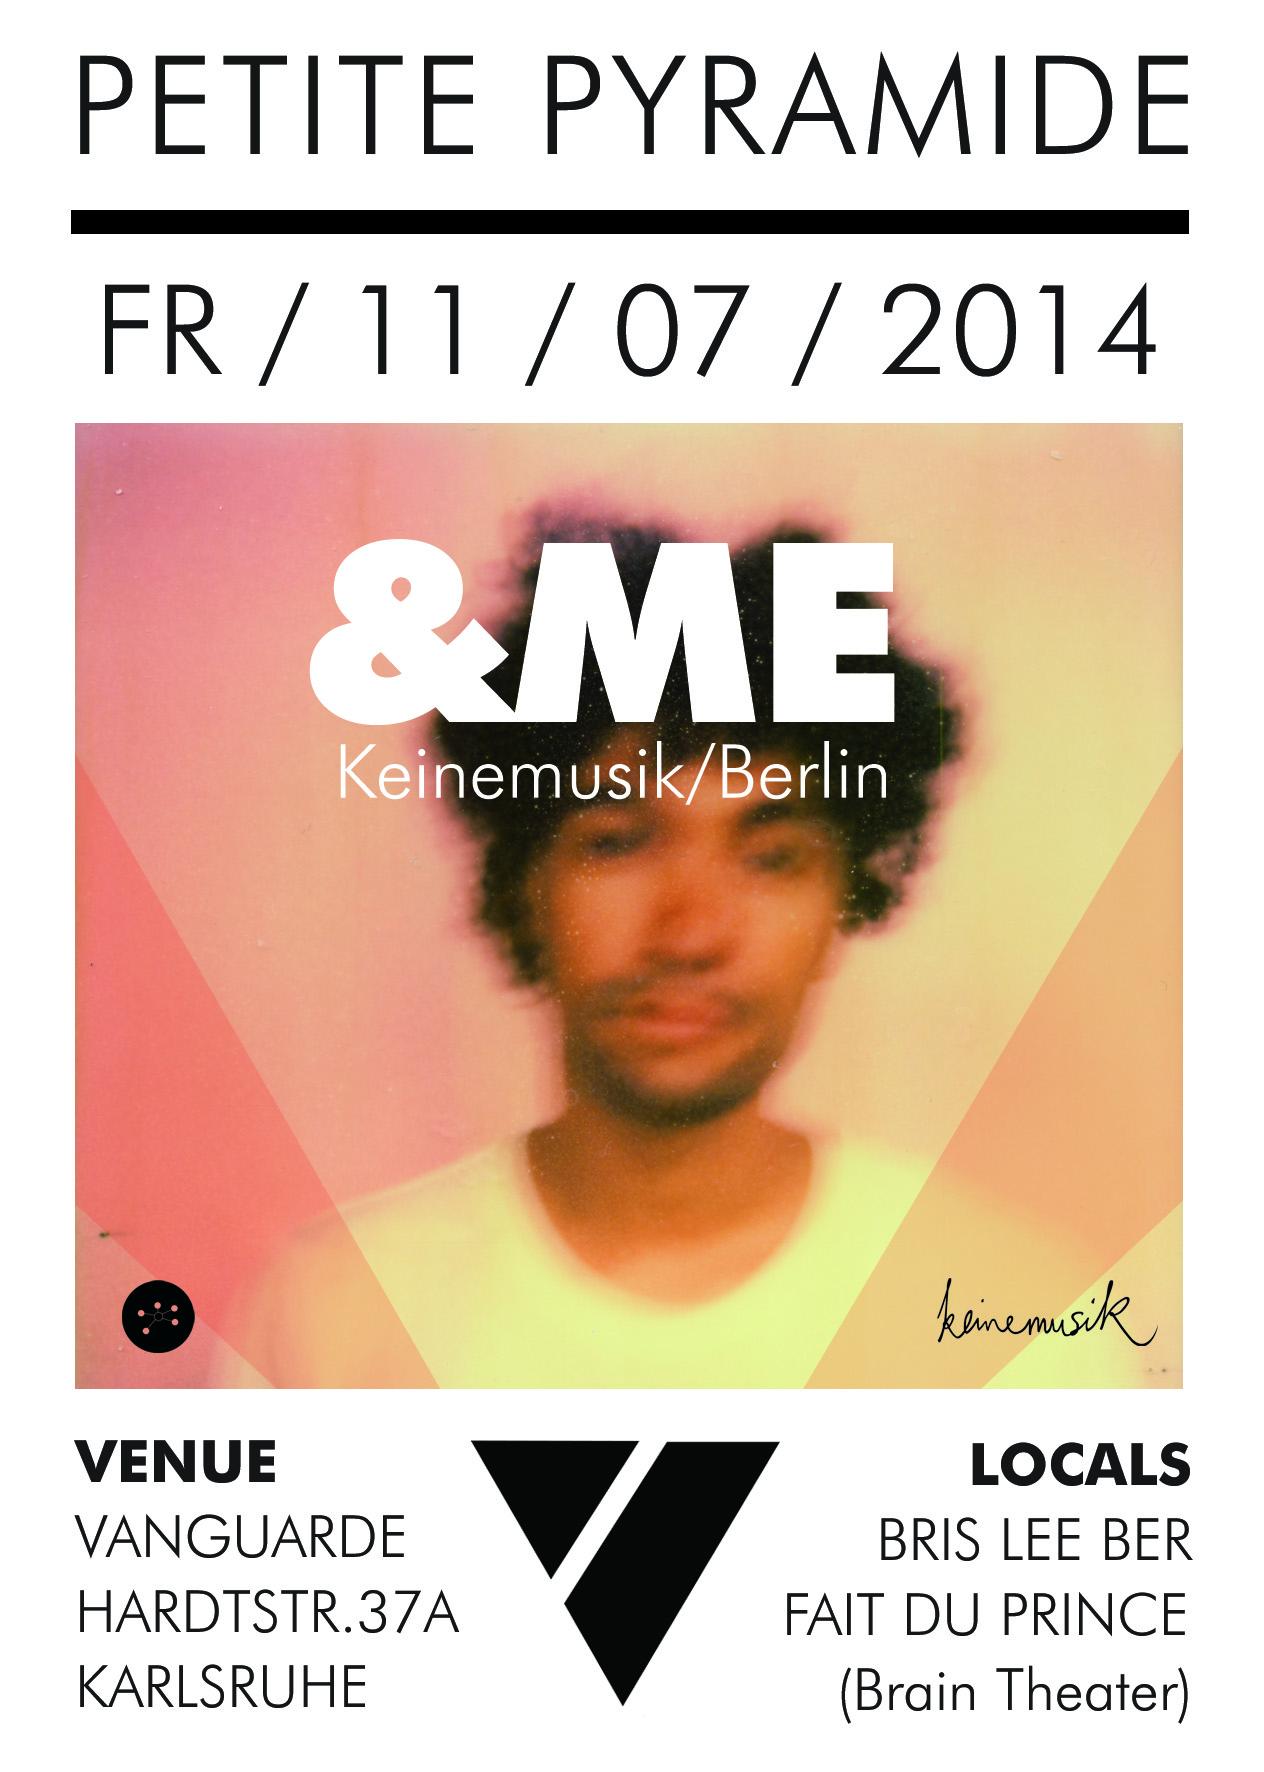 11.07.2014 | Petite Pyramide mit &ME (Keinemusik/Berlin)